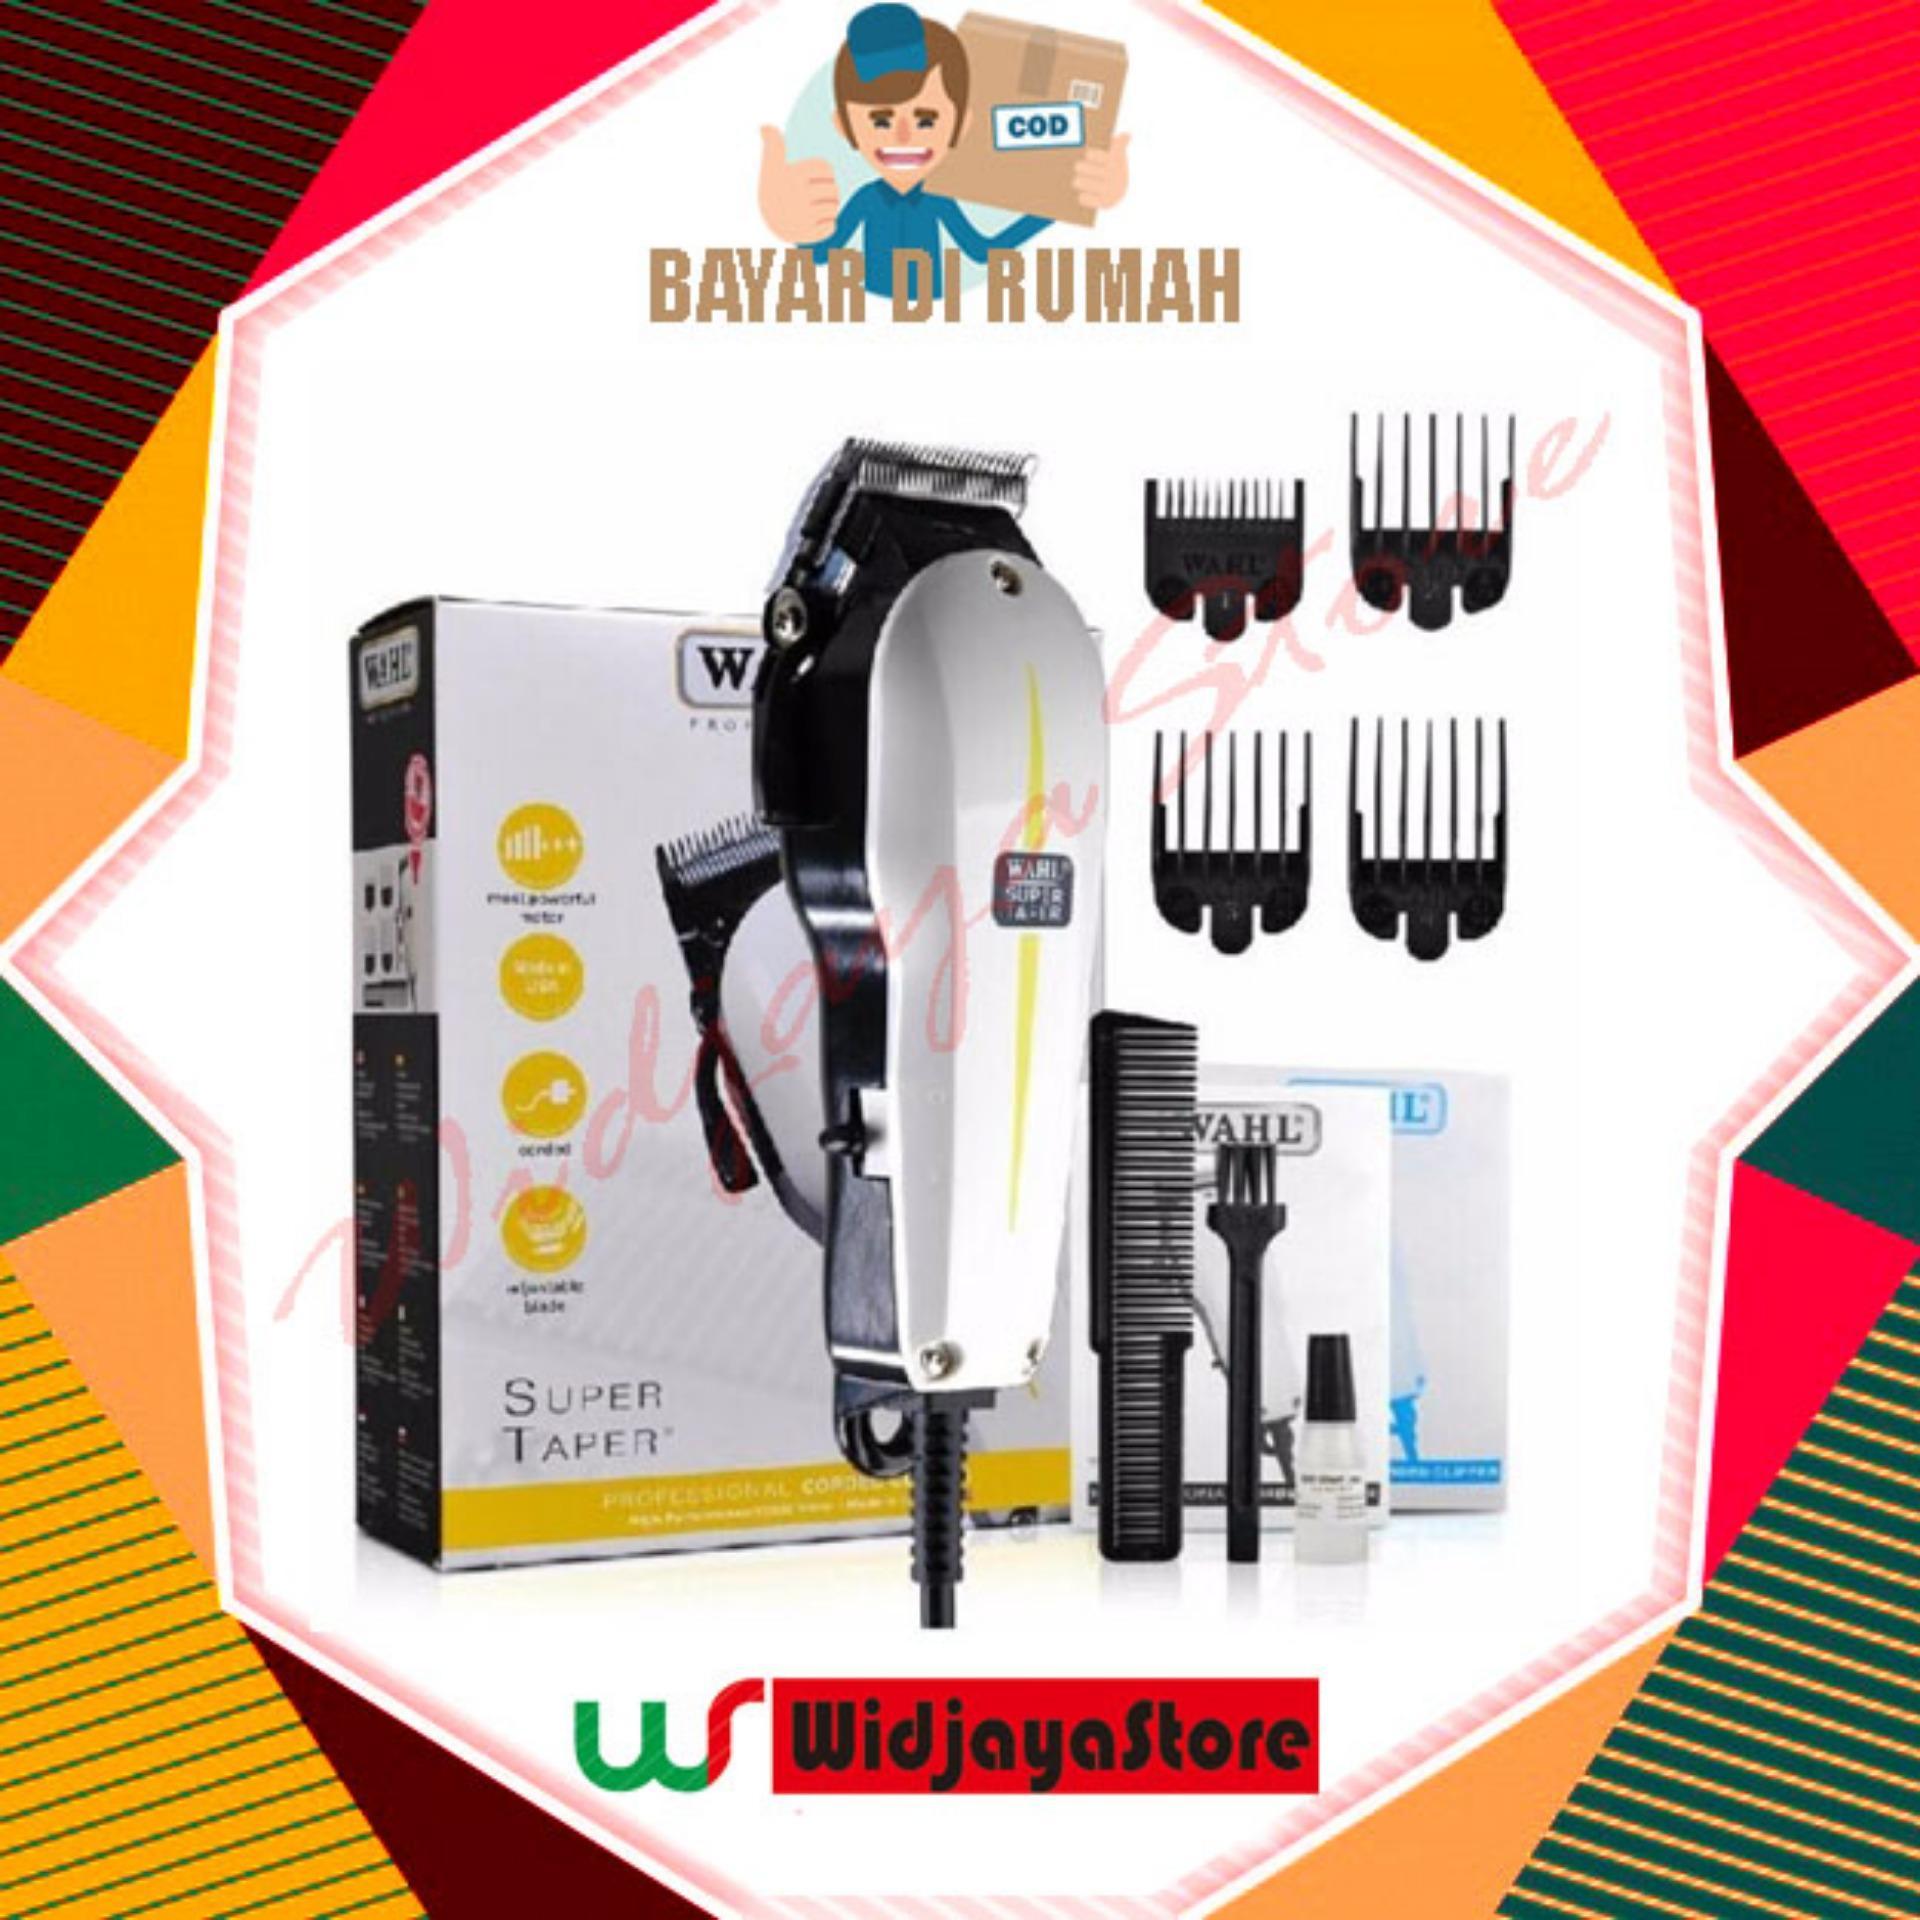 ALAT PANGKAS CUKUR RAMBUT PROFESSIONAL WAHL SUPER TAPER HAIR CLIPPER 5f0355e07b